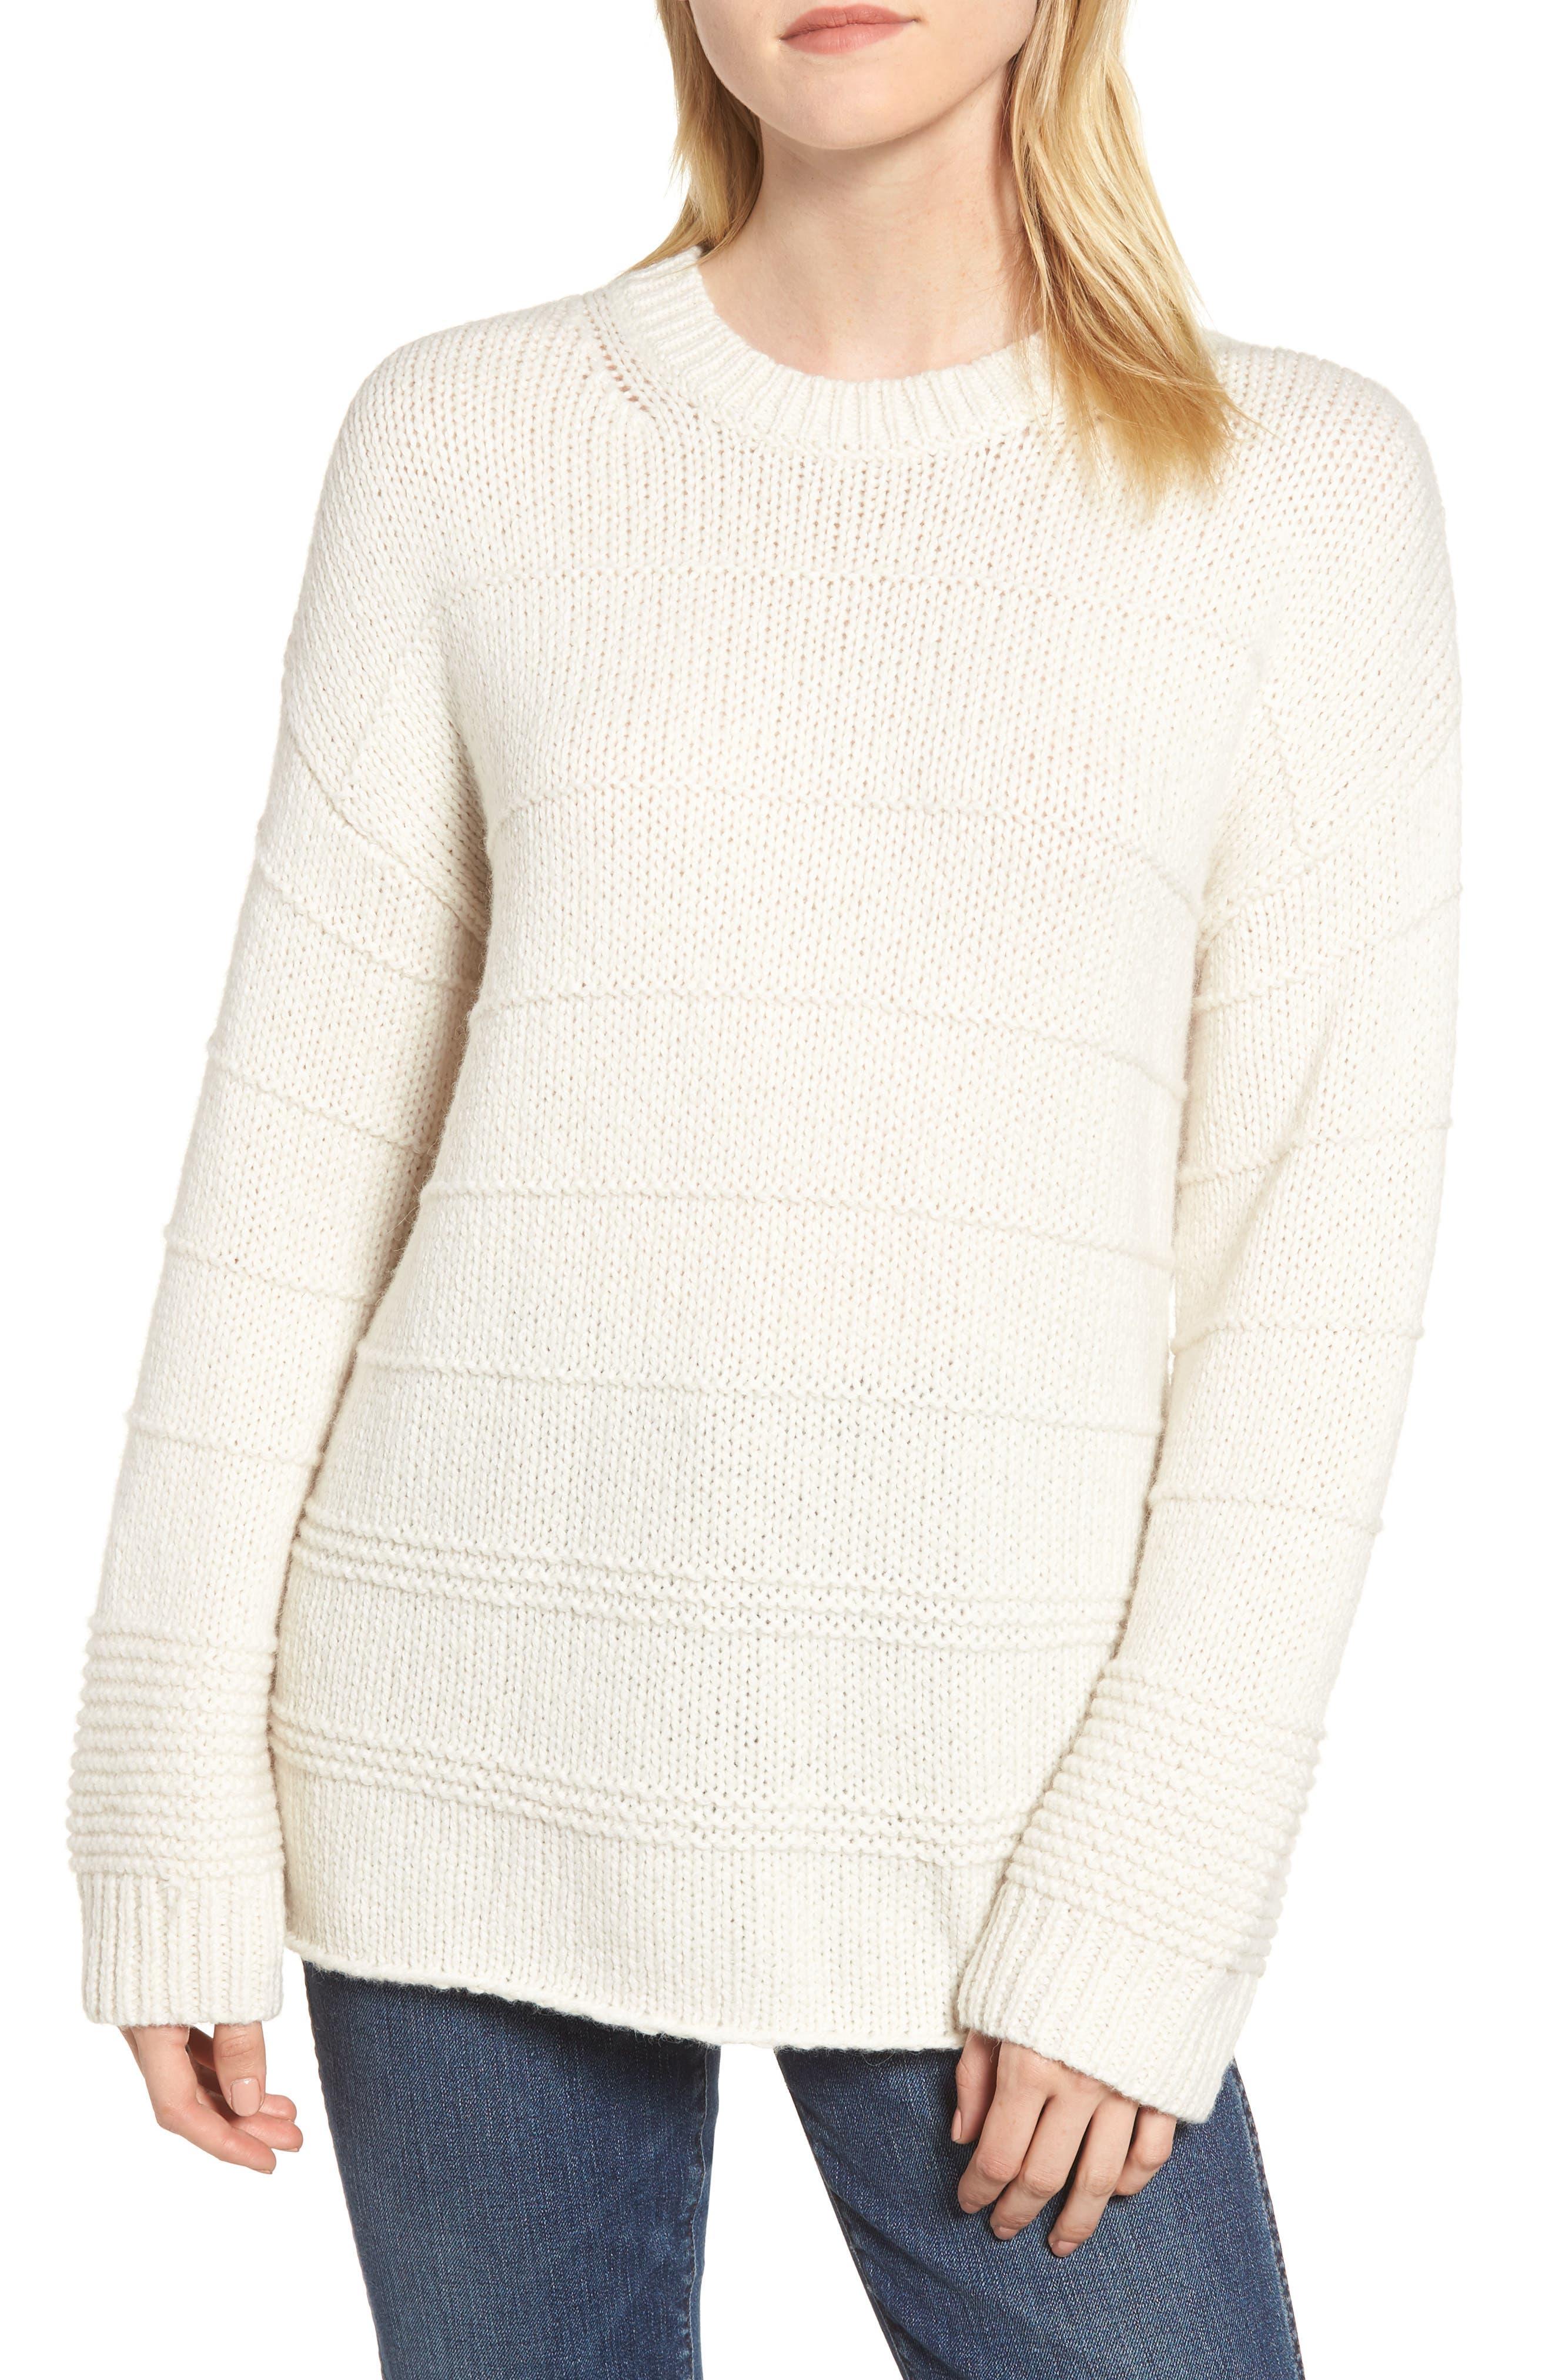 Velvet By Graham & Spencer Stripe Stitch Wool Alpaca Blend Sweater, White